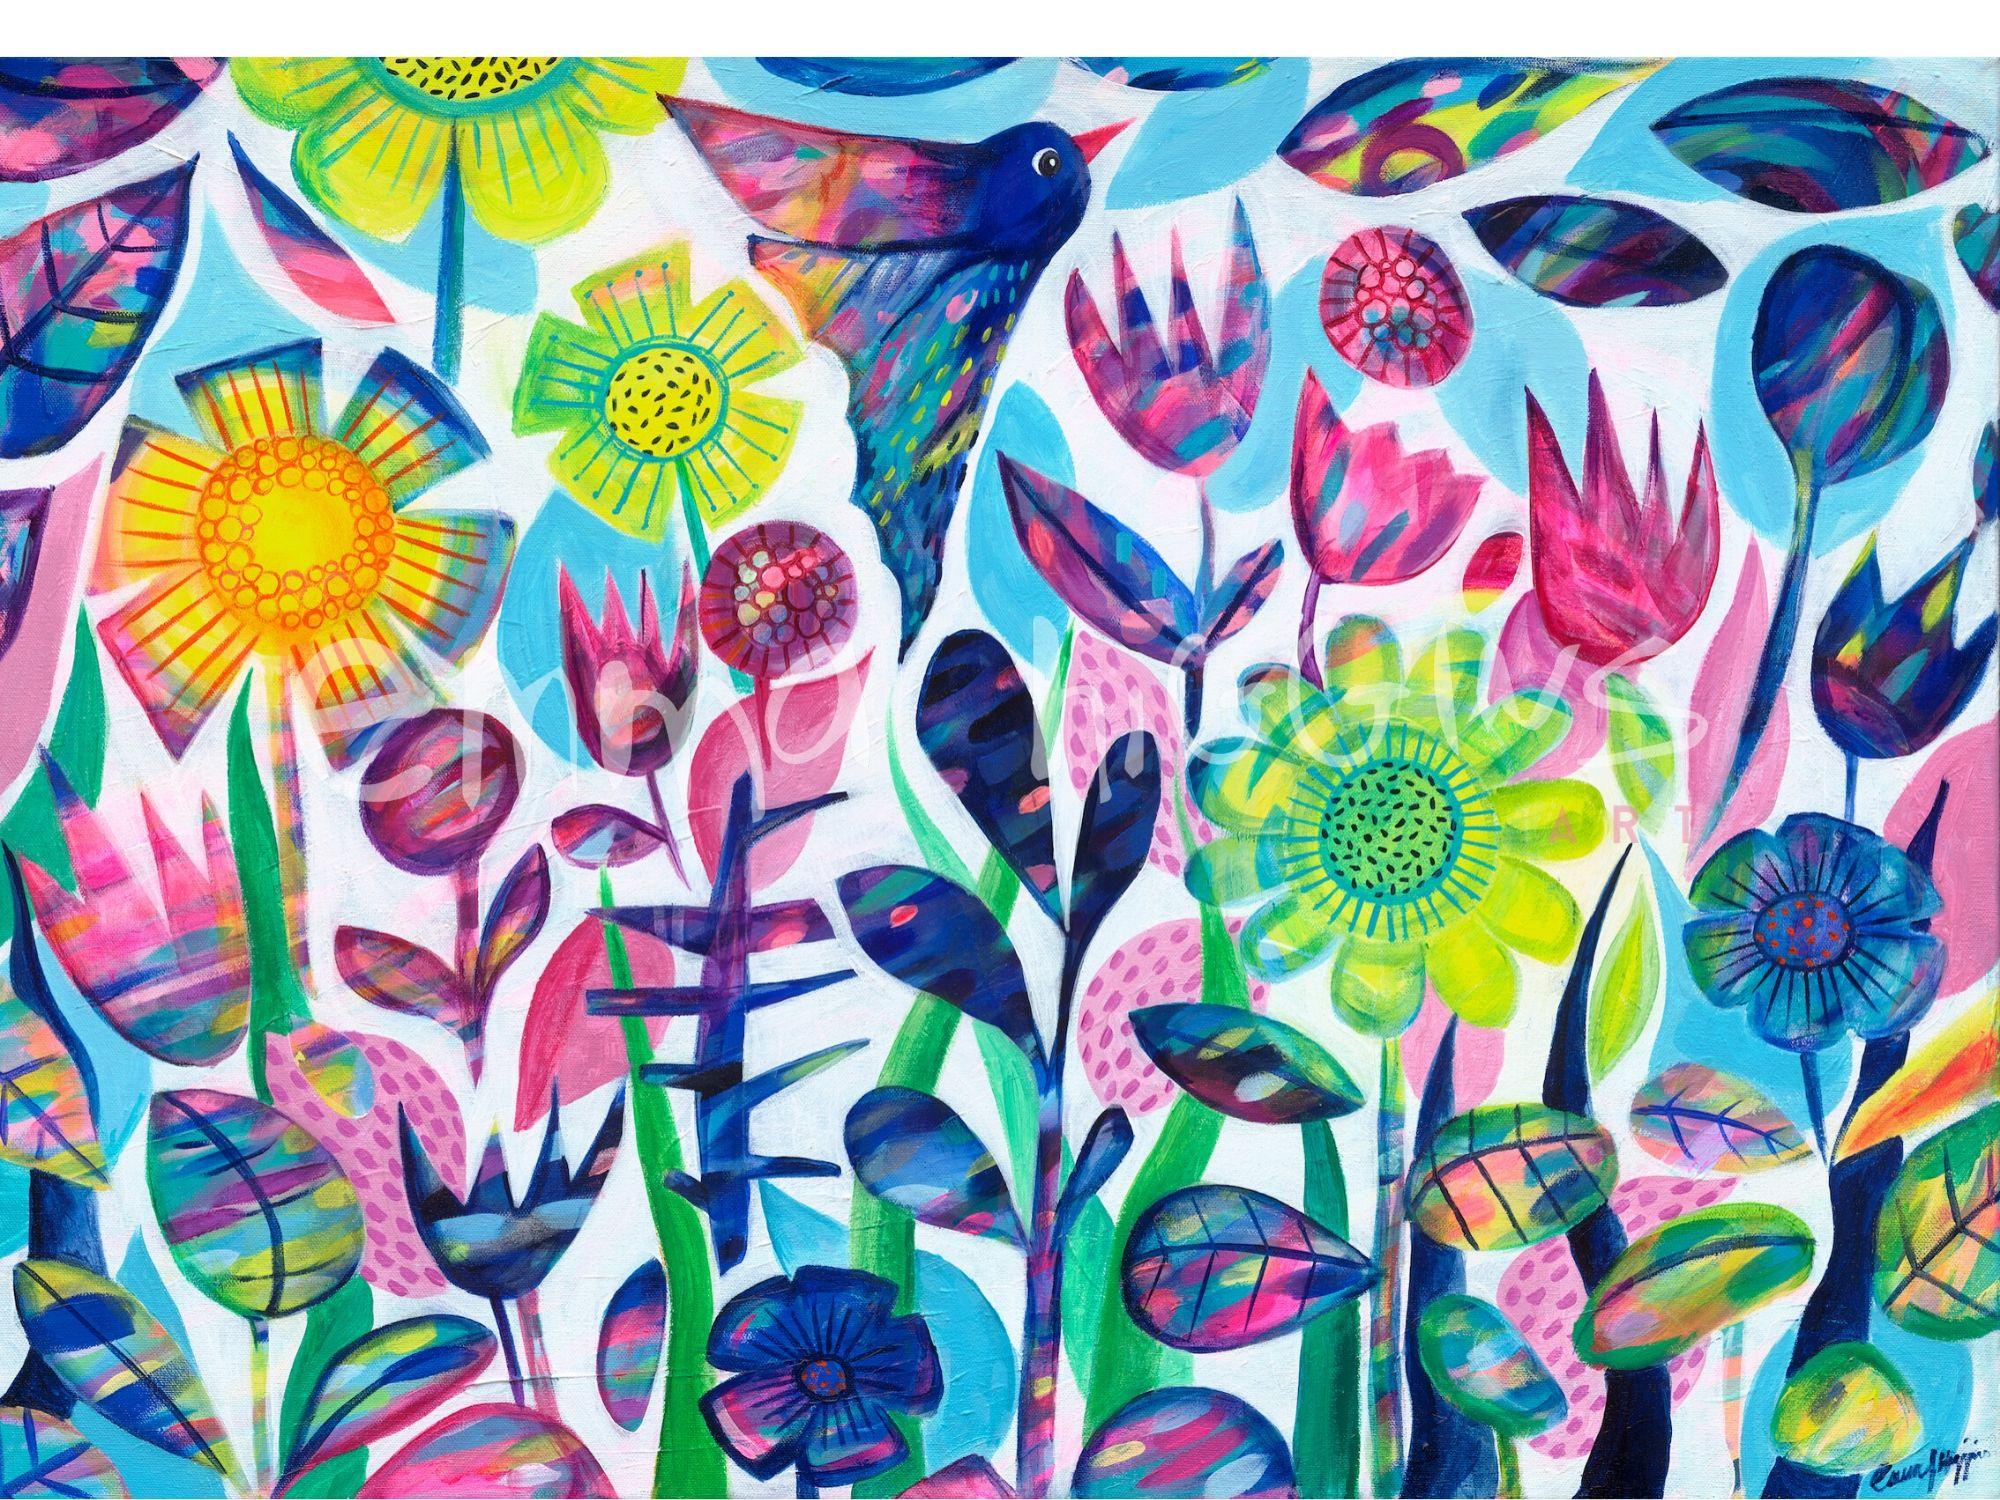 'The Flutter' 70 x 90 cm